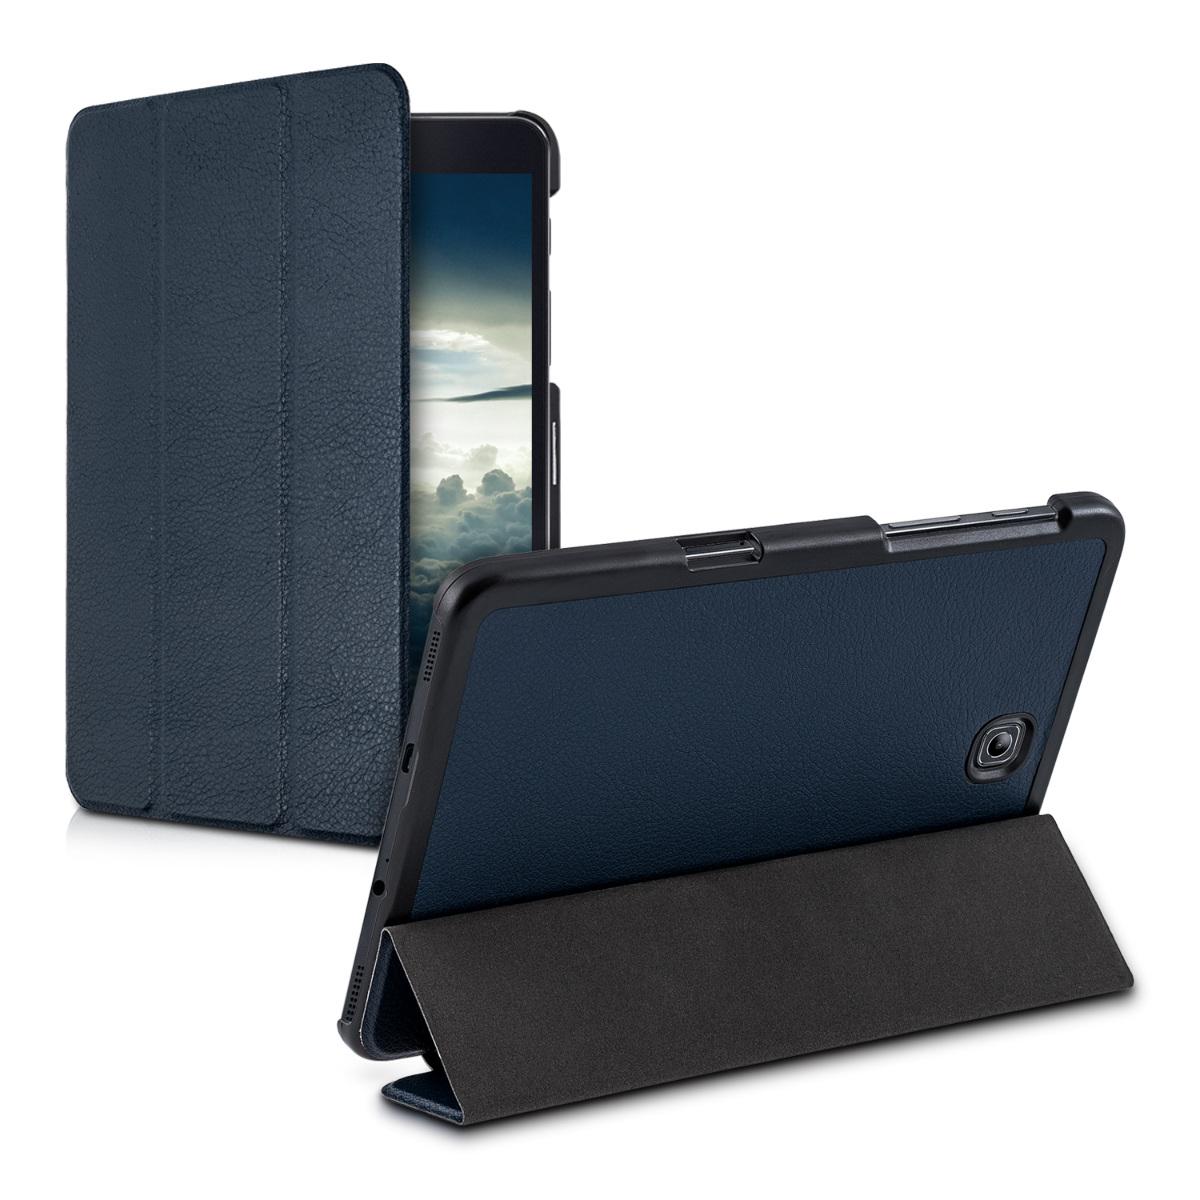 ultra slim cover for samsung galaxy tab s2 8 0 hard shell case tablet bumper ebay. Black Bedroom Furniture Sets. Home Design Ideas